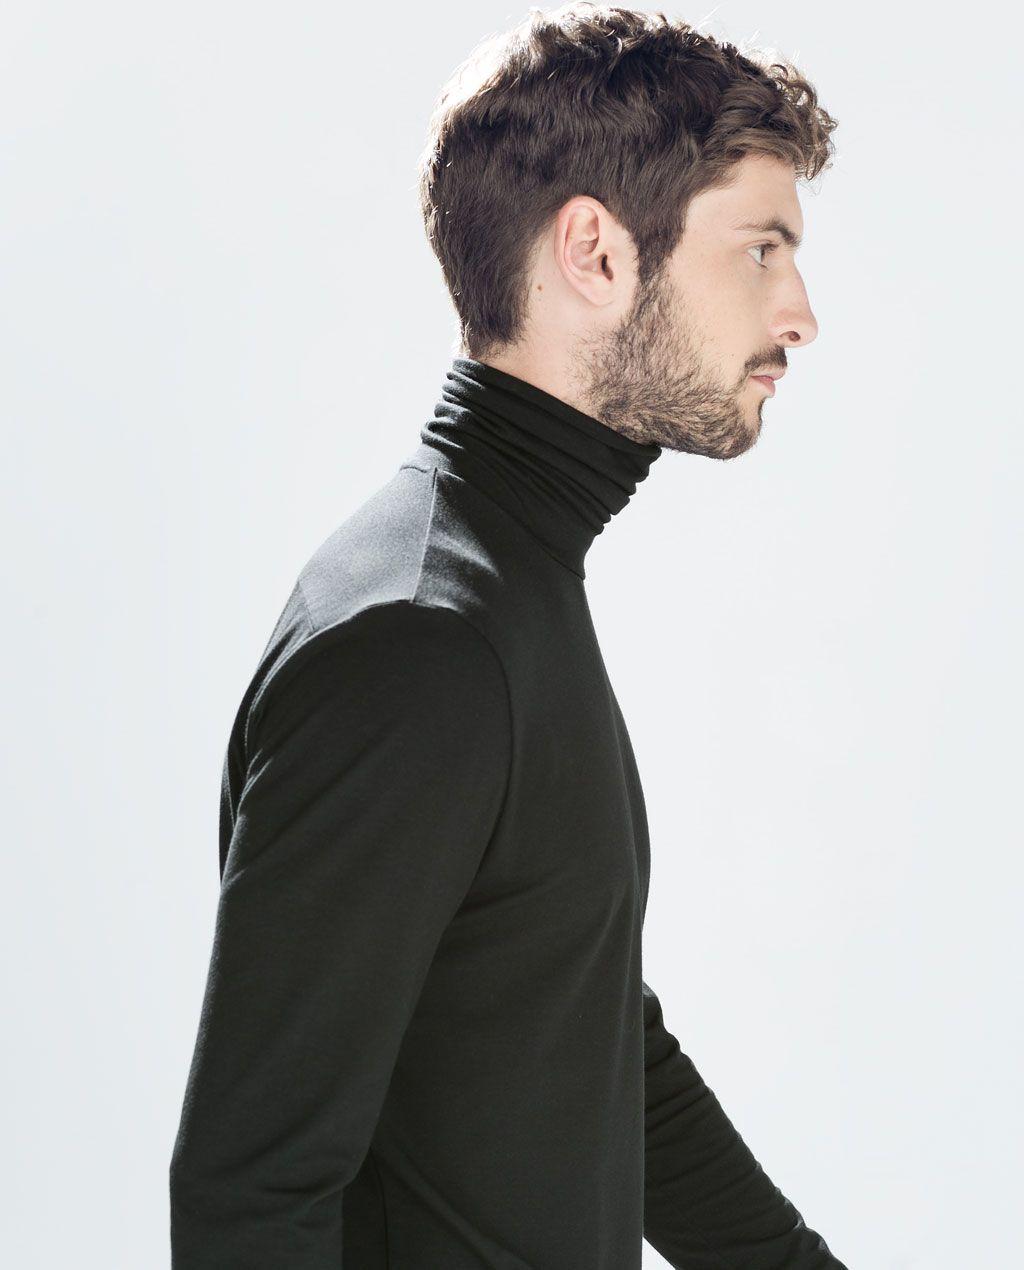 c3a3c952 ZARA - MAN - TURTLENECK T-SHIRT | Man fashion | Turtleneck t shirt ...